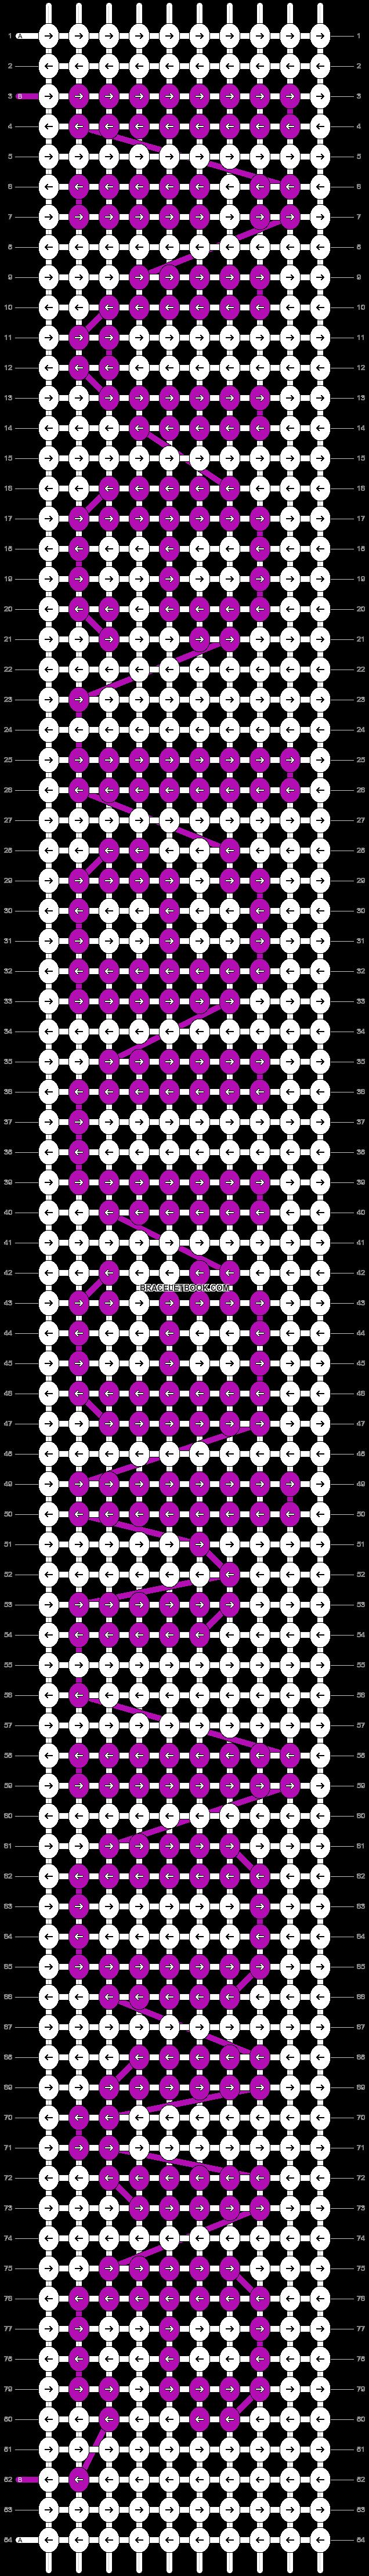 Alpha pattern #6675 pattern